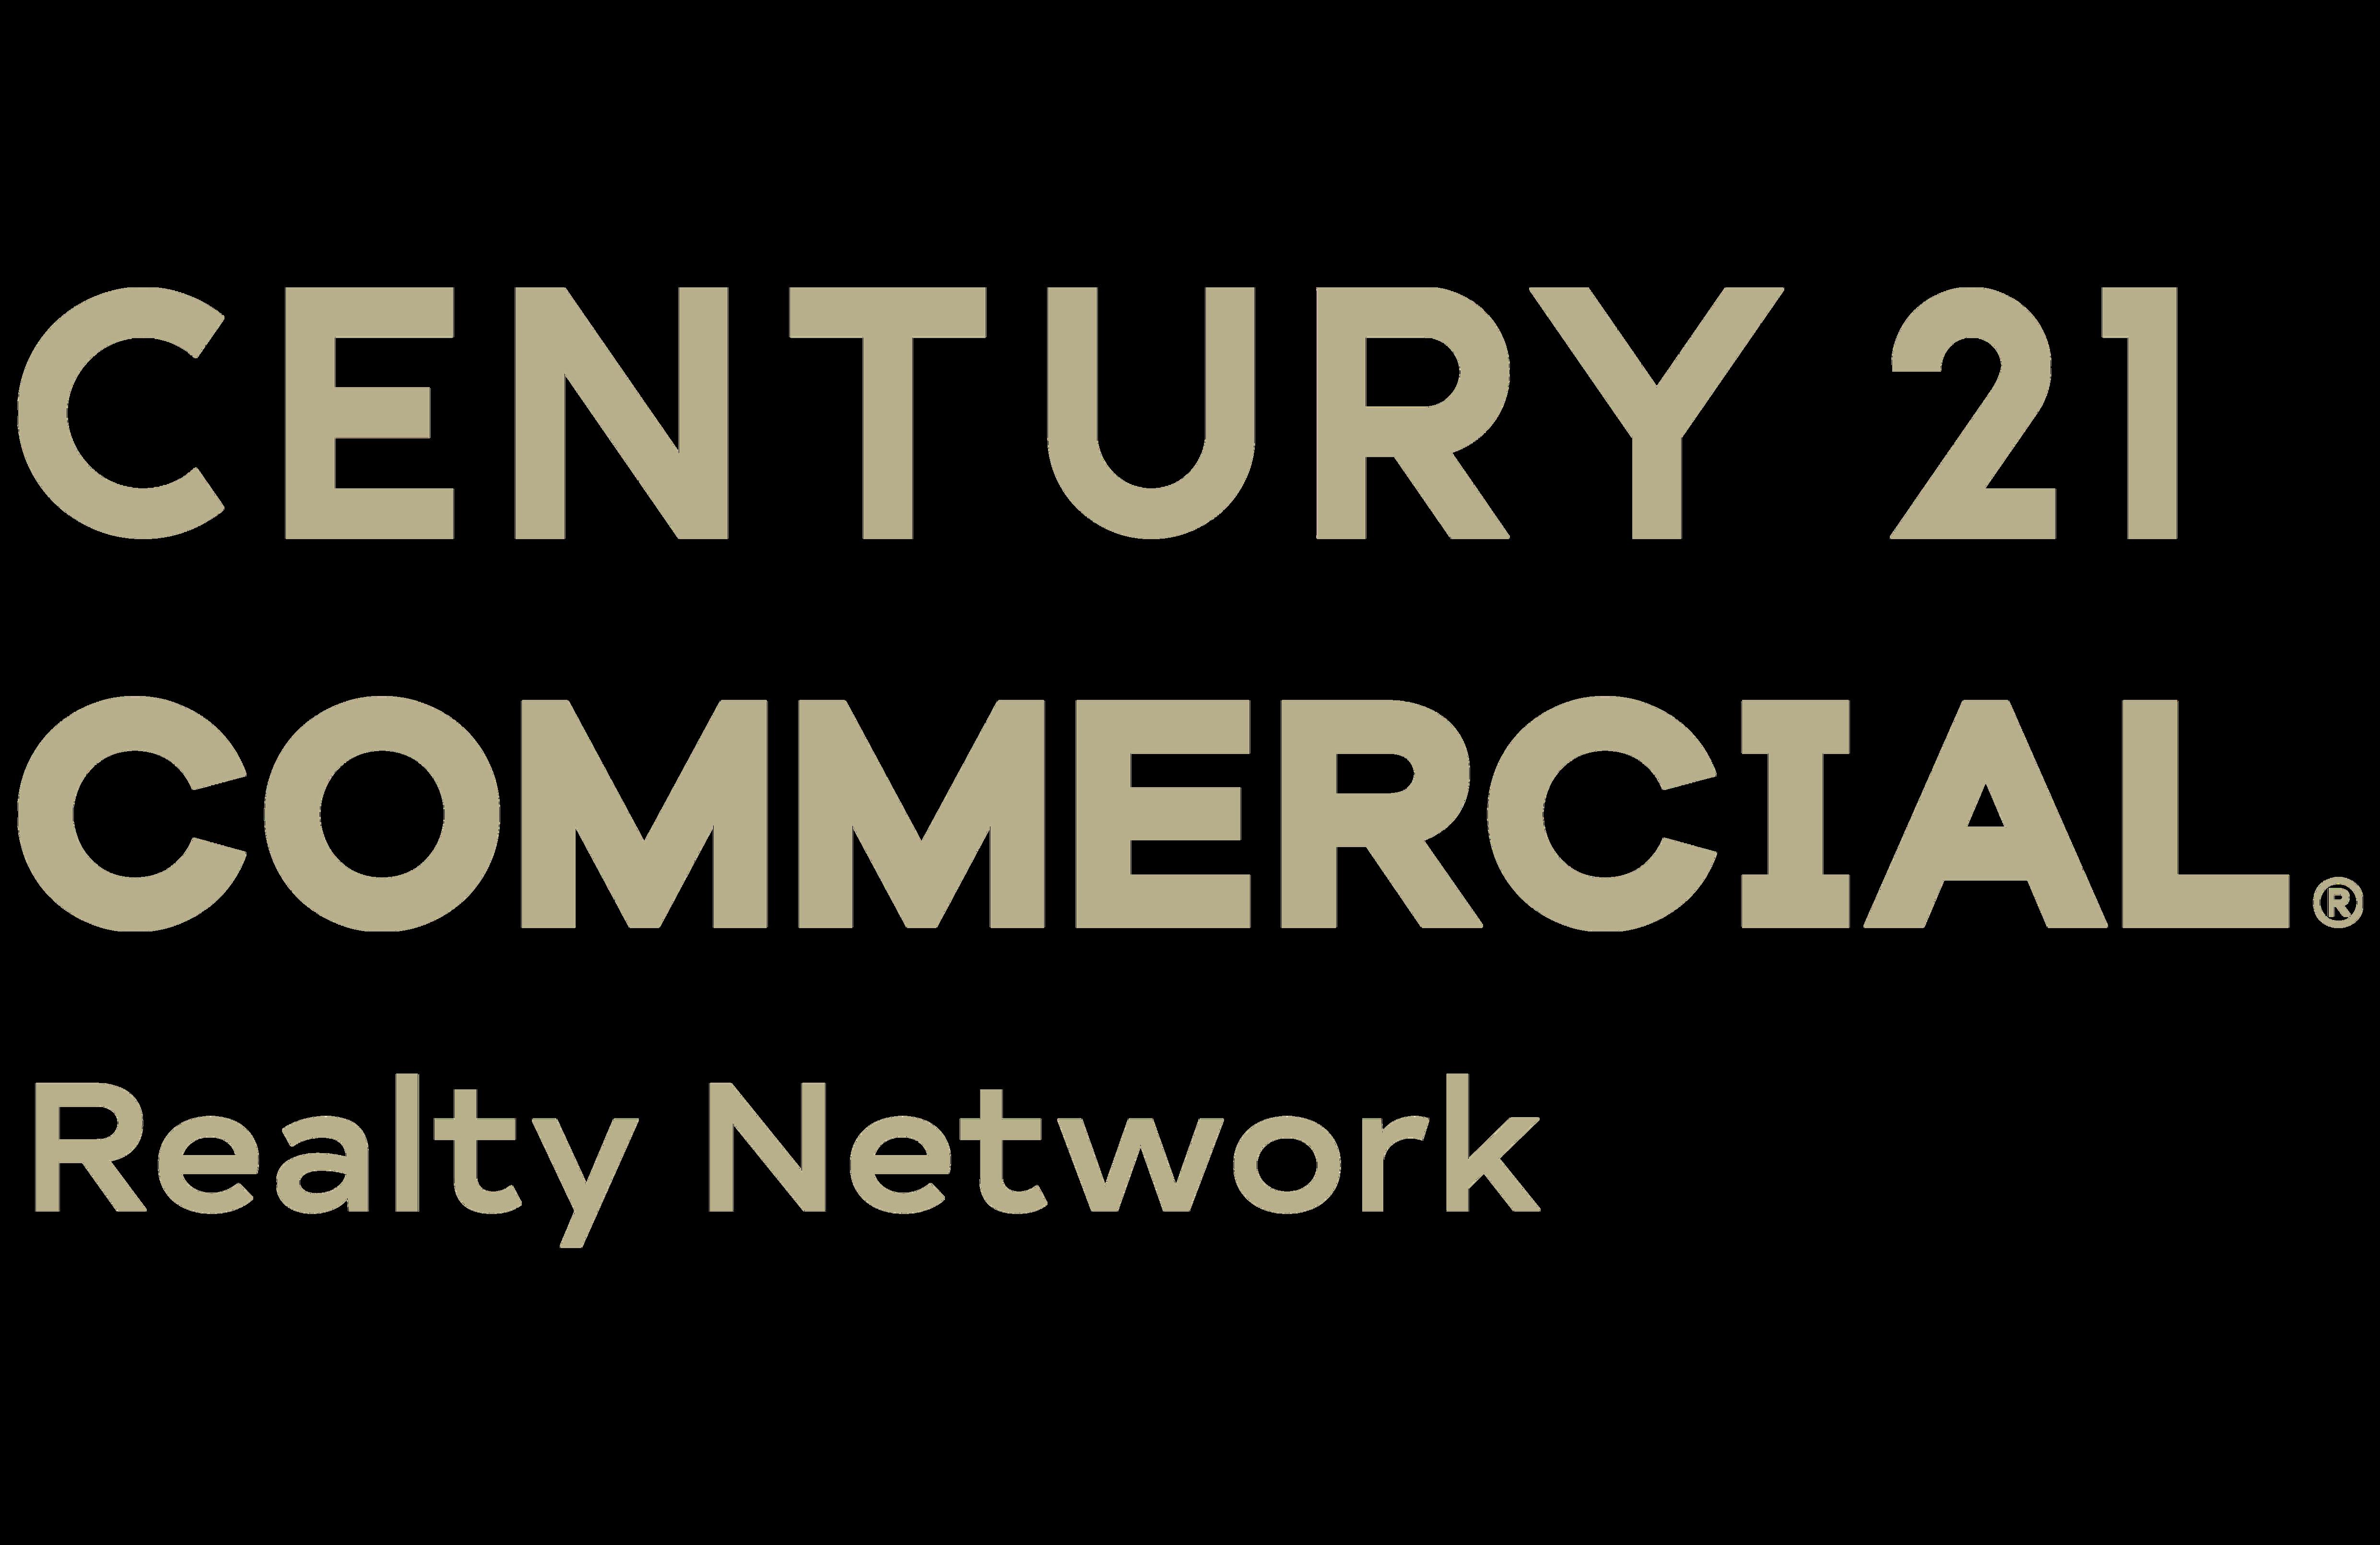 CENTURY 21 Realty Network